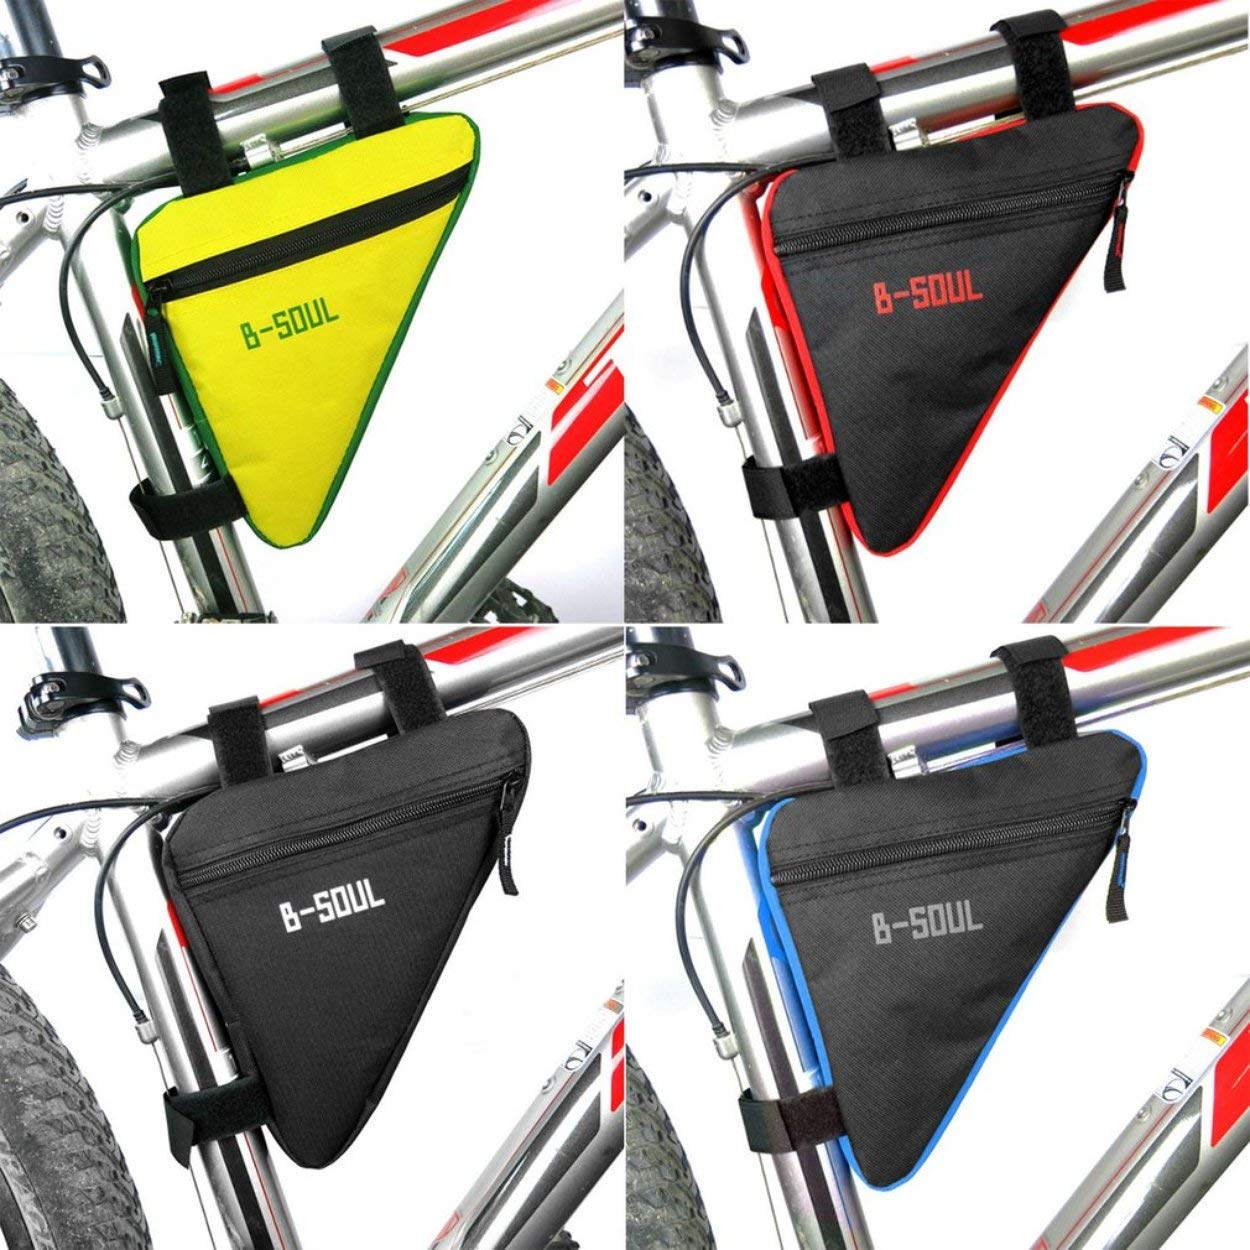 Lorenlli Fit B-Soul Impermeable Tri/ángulo Ciclismo Bolsas de Bicicleta Tubo Delantero Bolsa Marco Porta Bicicleta Sill/ín Bolsa Manillar Bicicleta Accesorios